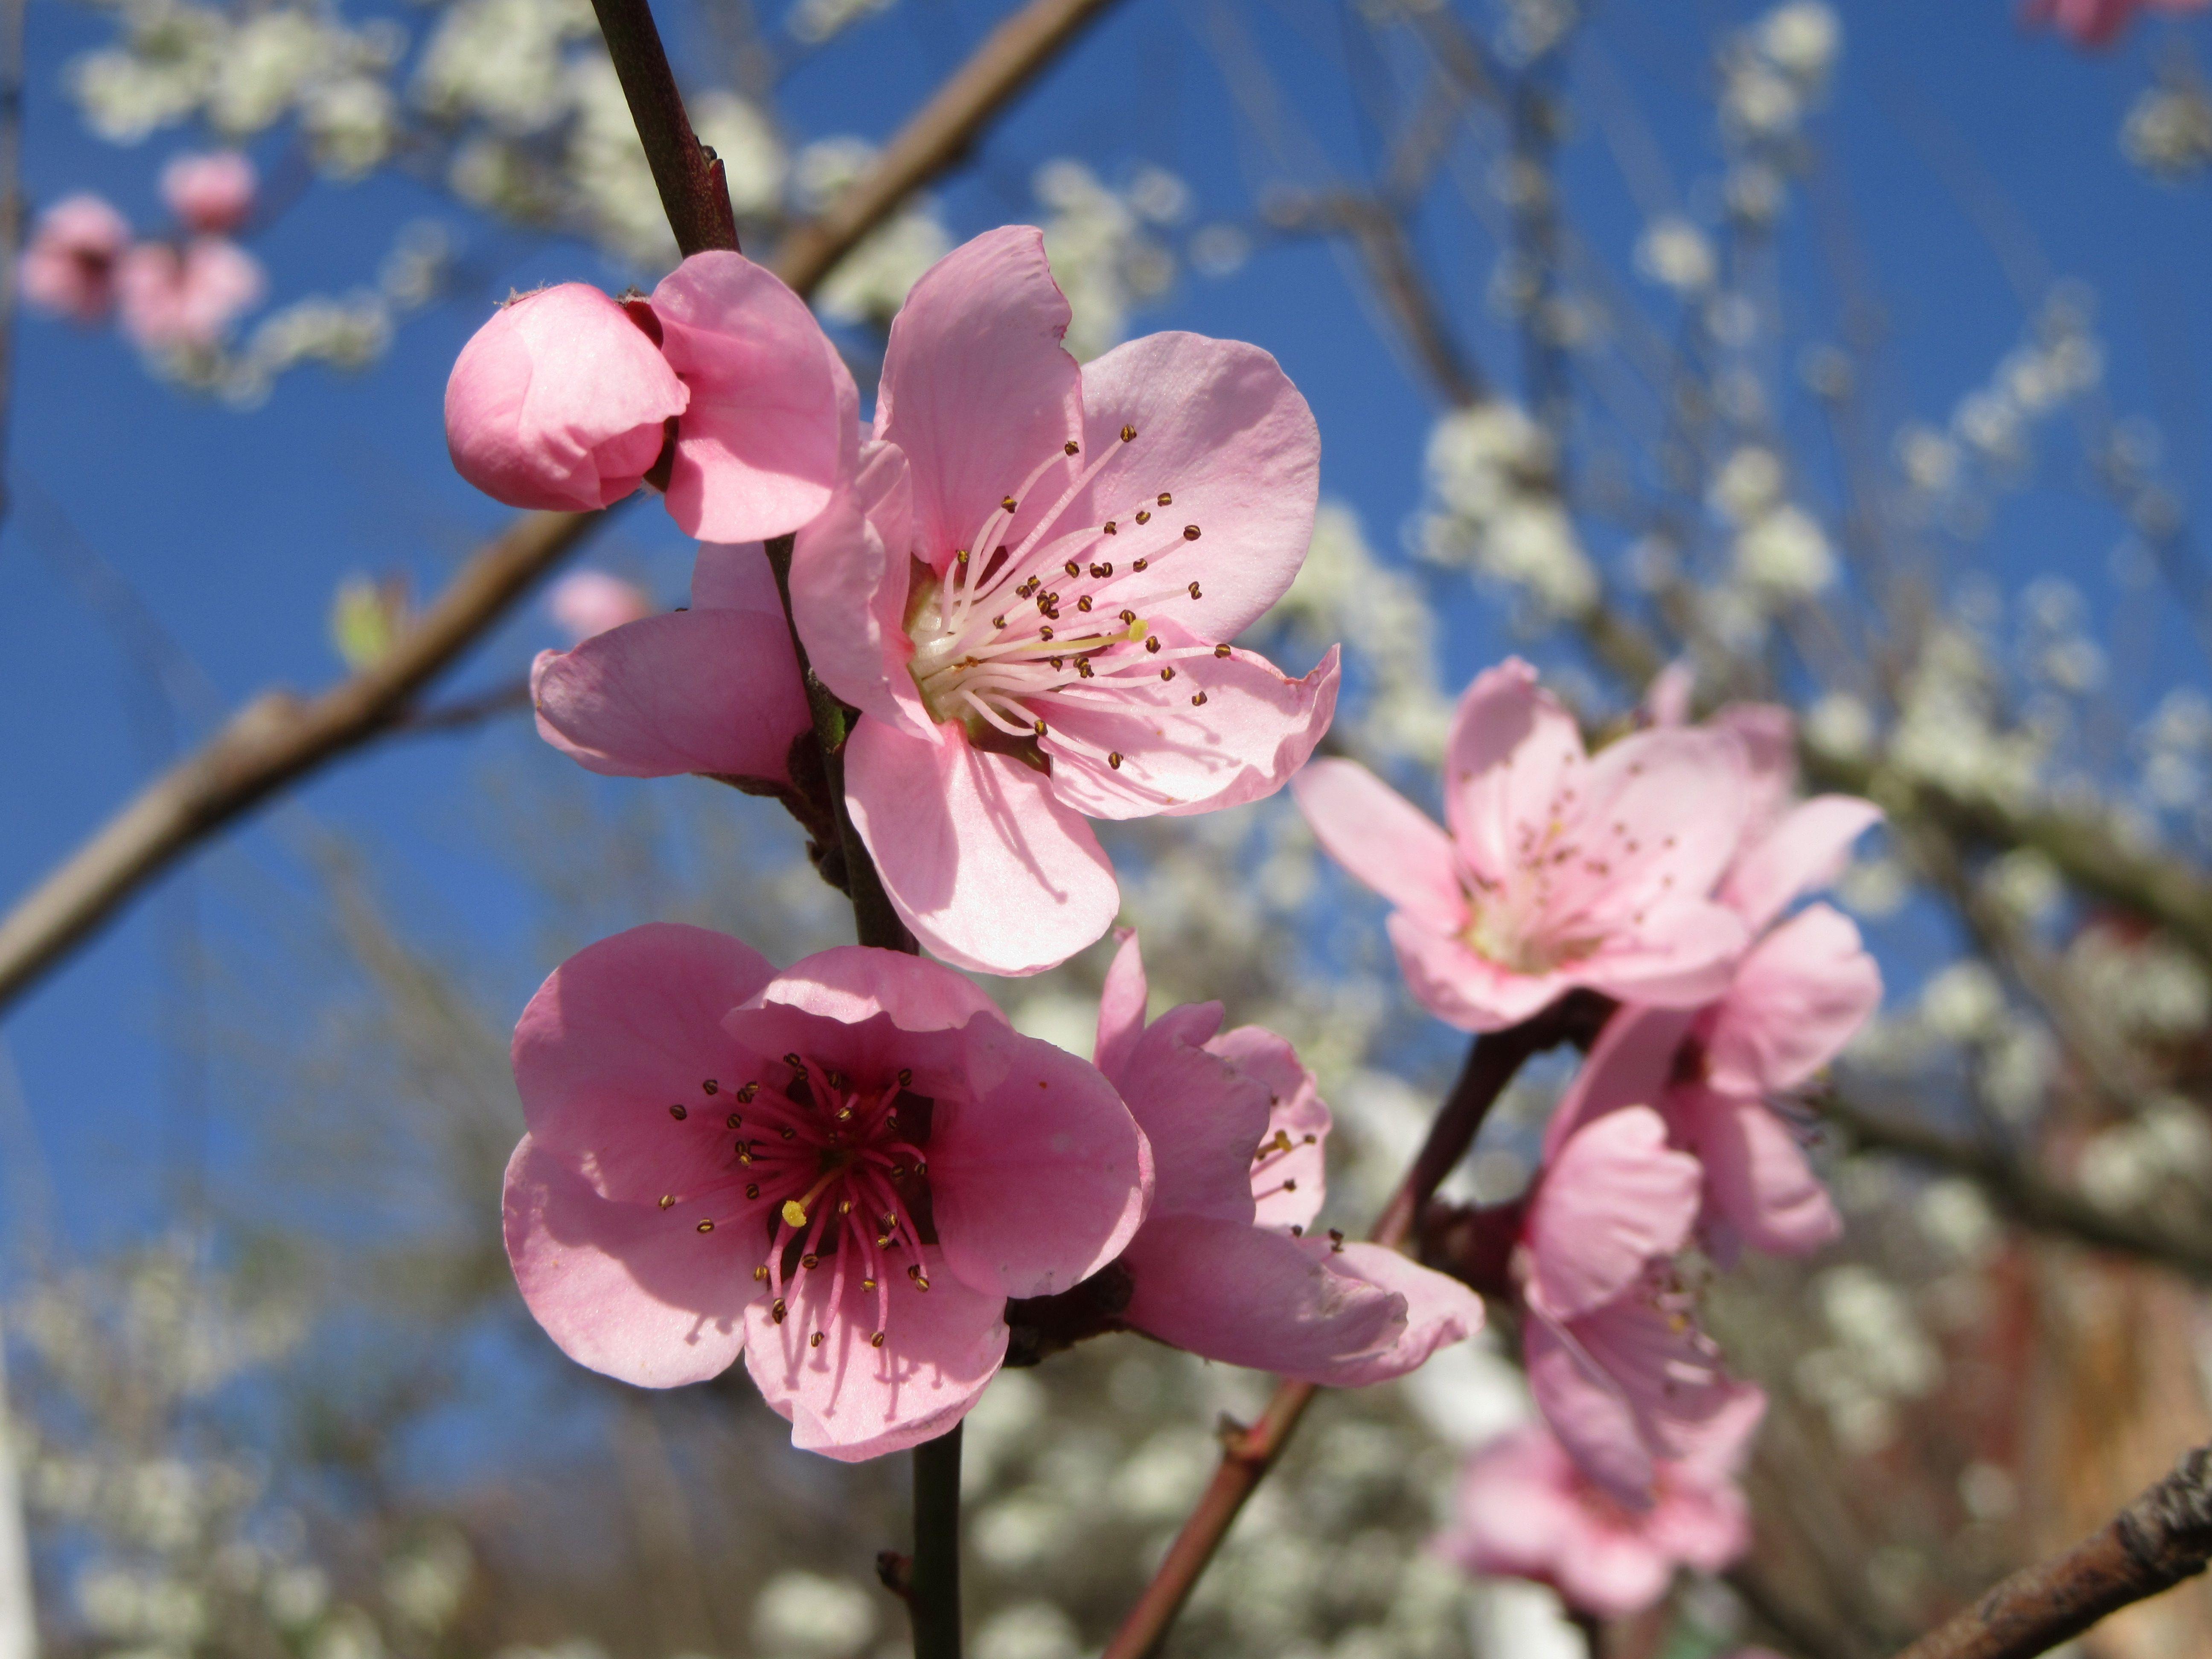 Free Images : sky, fruit, flower, petal, bloom, food ...